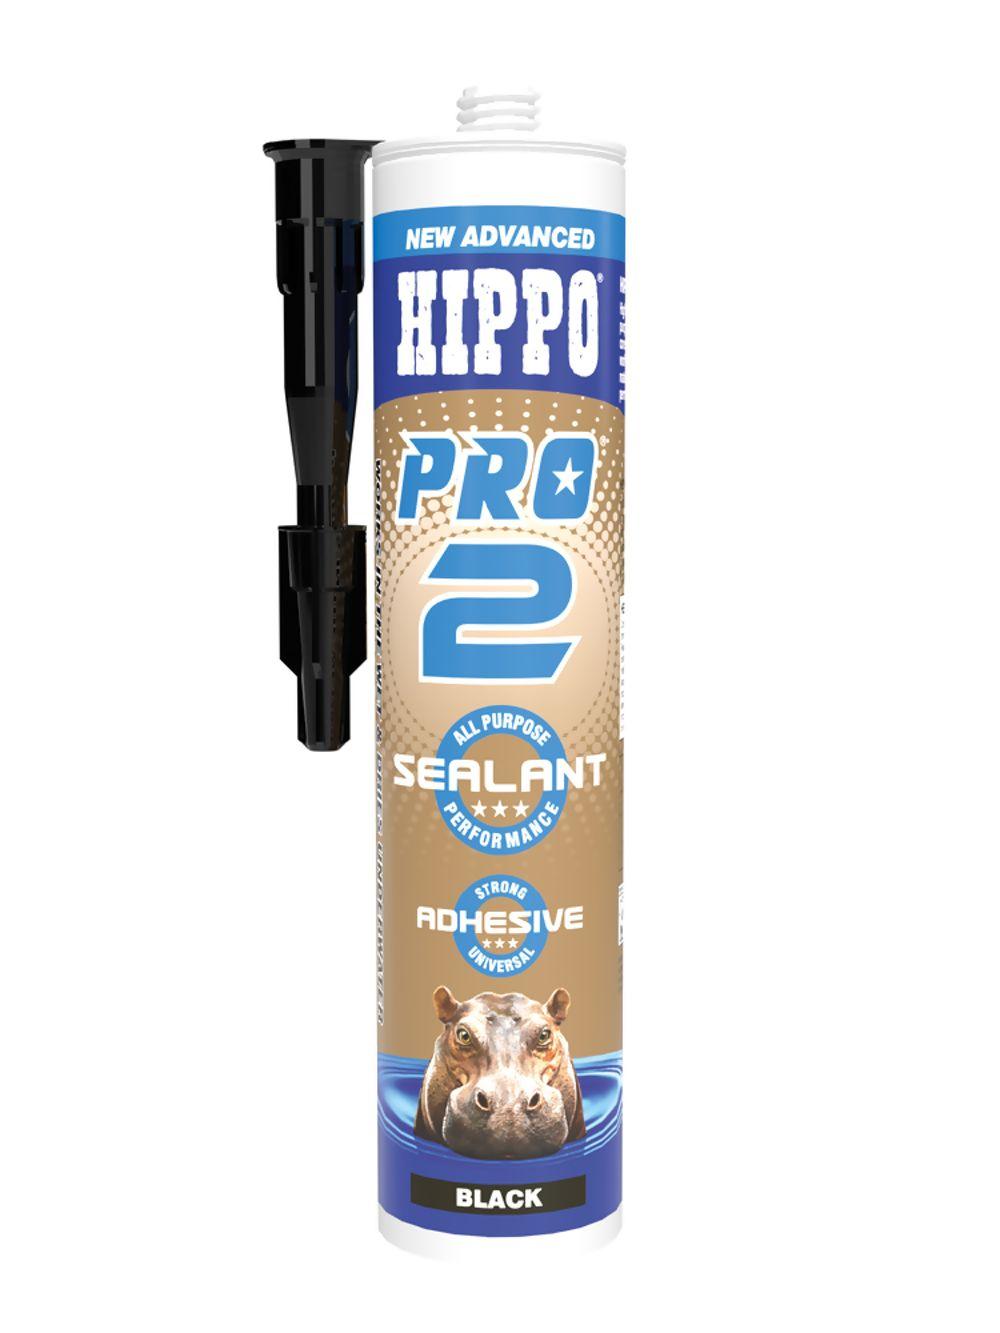 Hippo Pro 2 Sealant & Adhesive Black 310ml Ref H18544